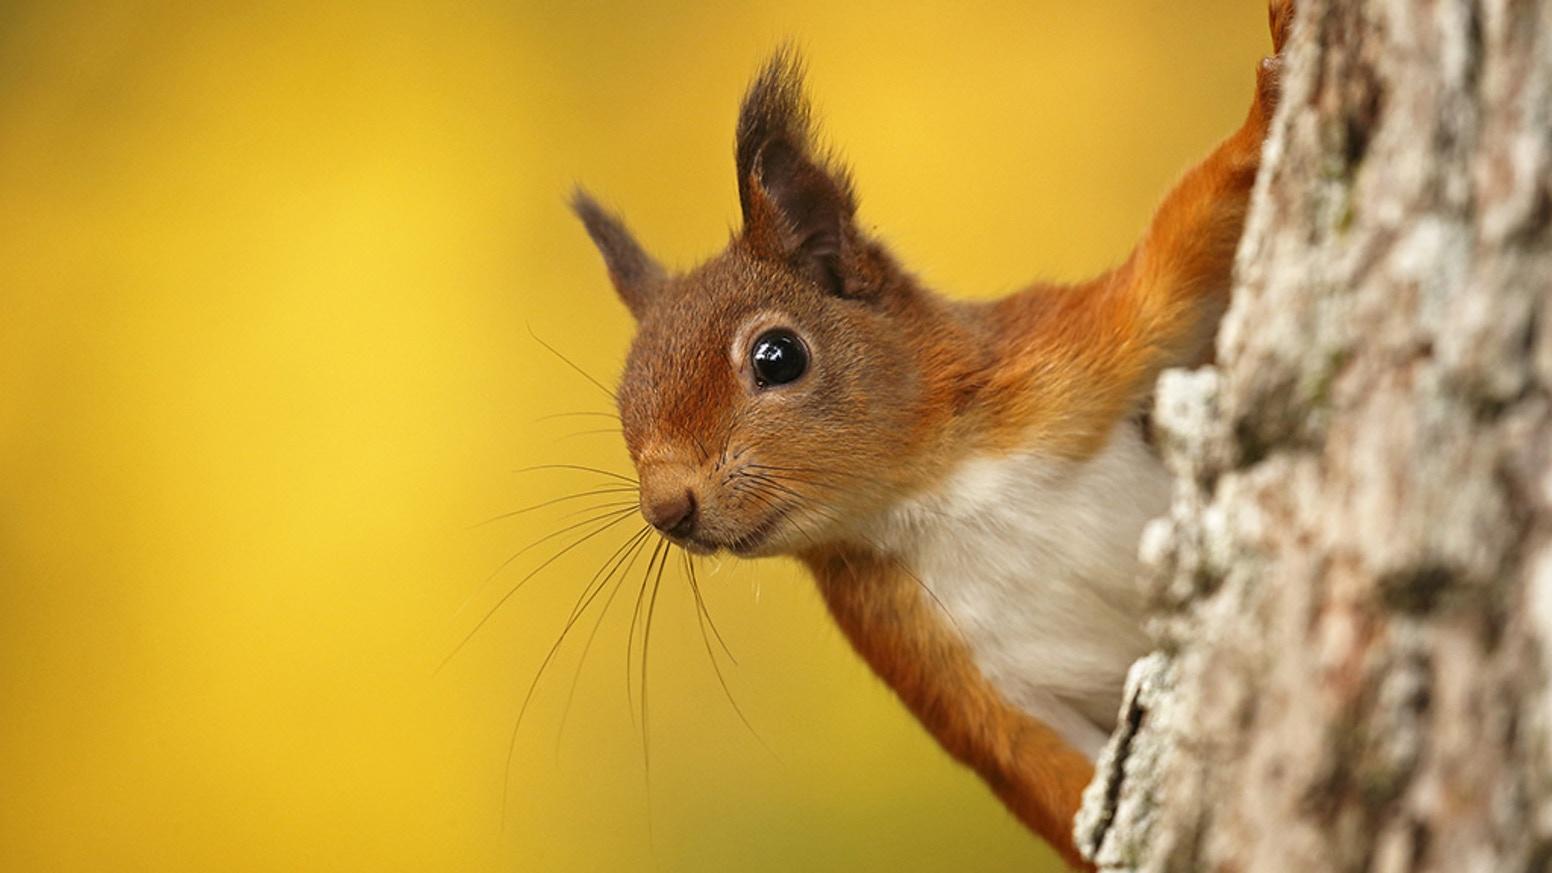 Squirrels And Bats Tonja S Gatherings